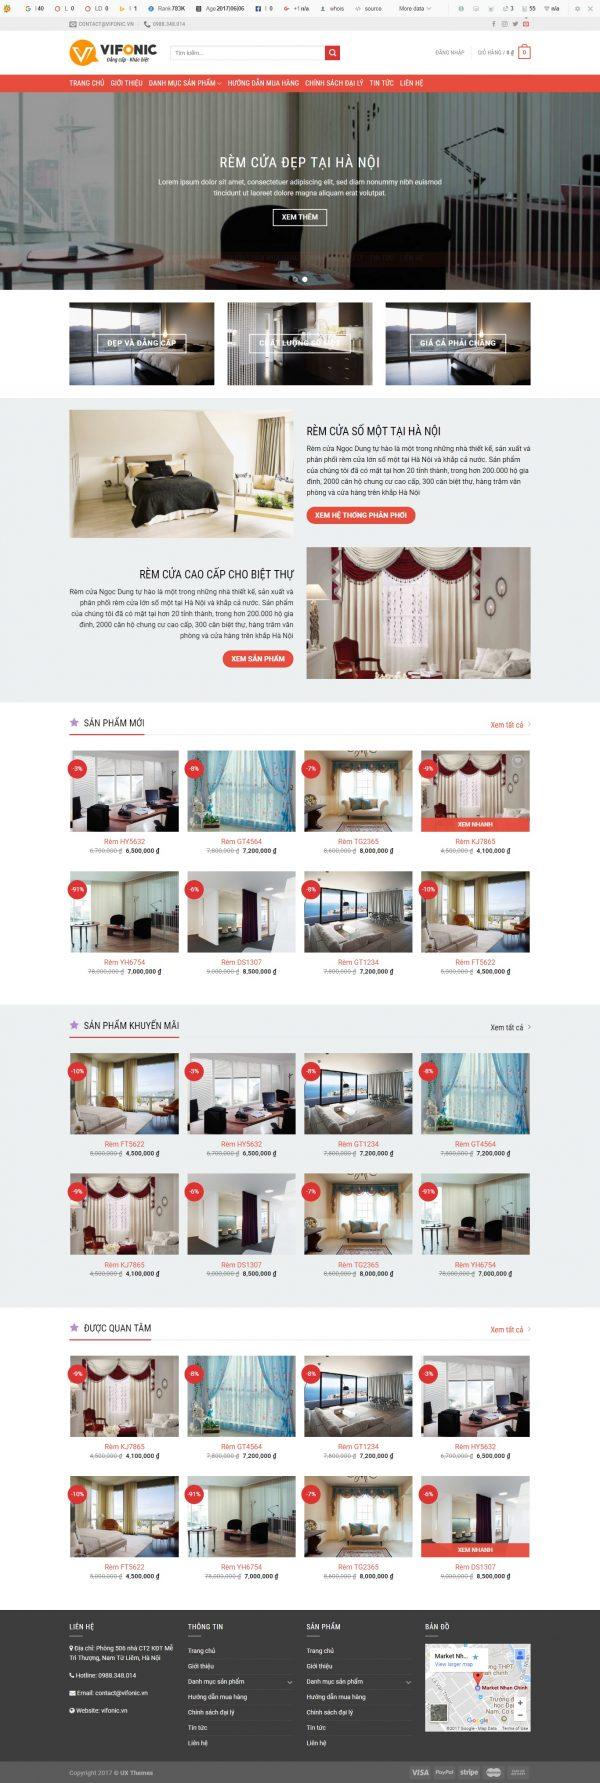 Thiết kế web nội thất mẫu 2